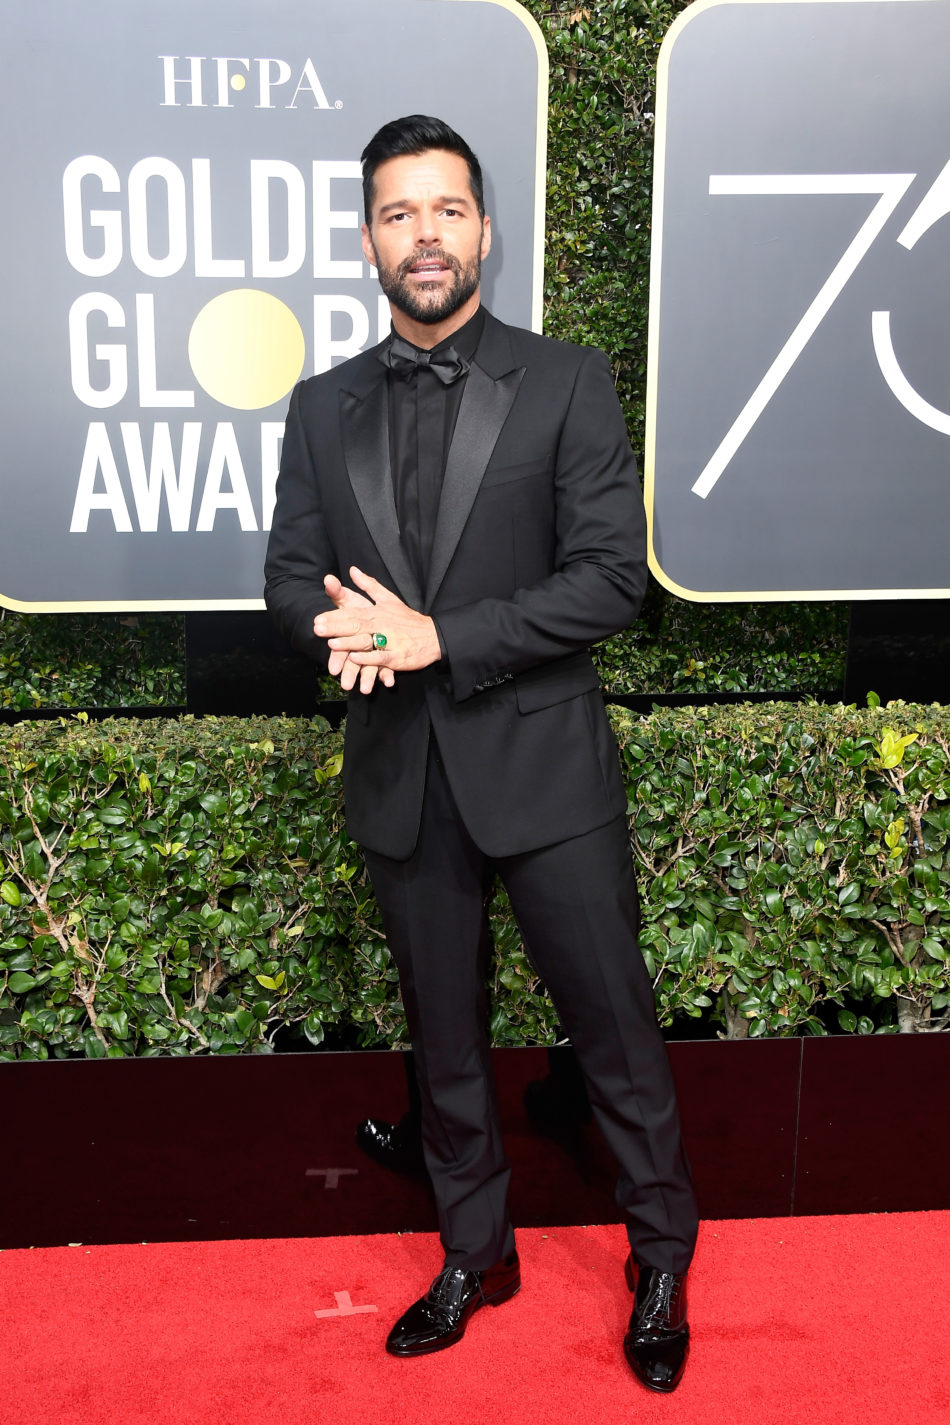 Golden Globes 2018, Red Carpet, Alfombra Roja, Tuxedos, Trajes, Ternos, Hombres, Looks, Outfits, Premiación, Masculinos, Estilismos, Vestir bien, Ricky Martin